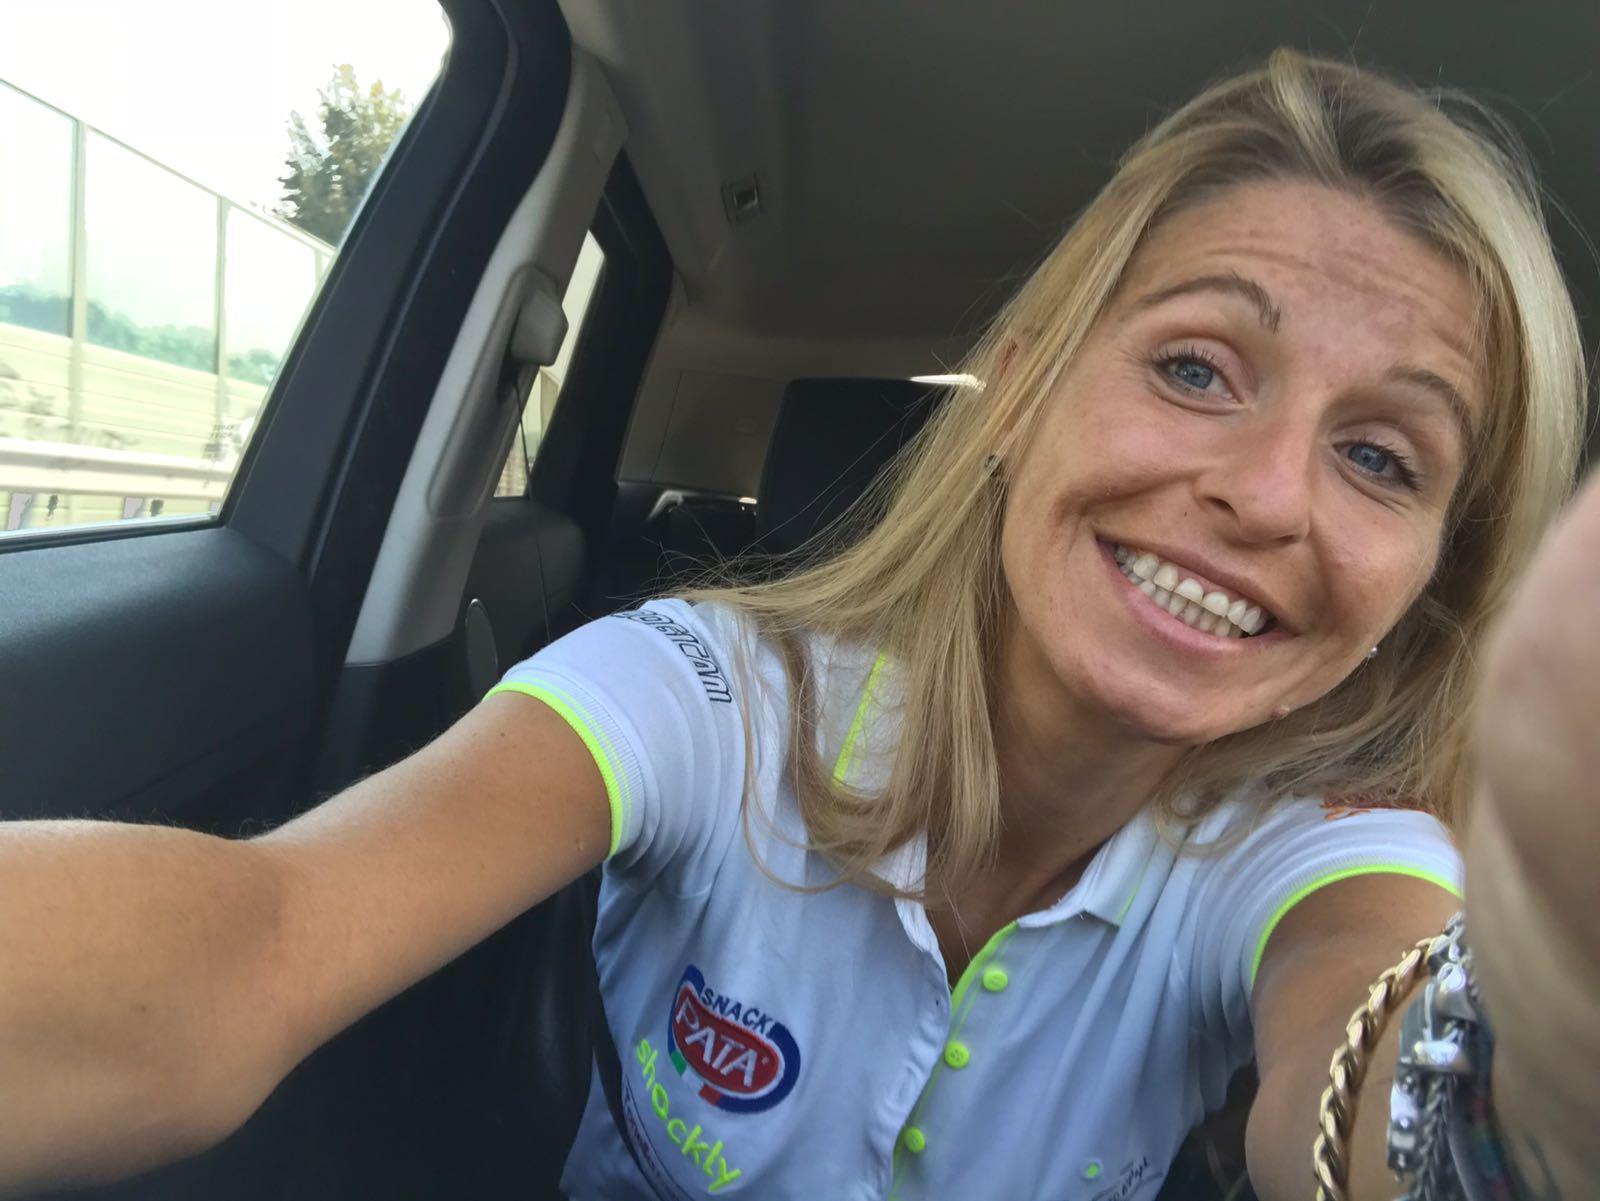 Shockly partner della Squadra Ufficiale Pata Yamaha WorldSBK 2017